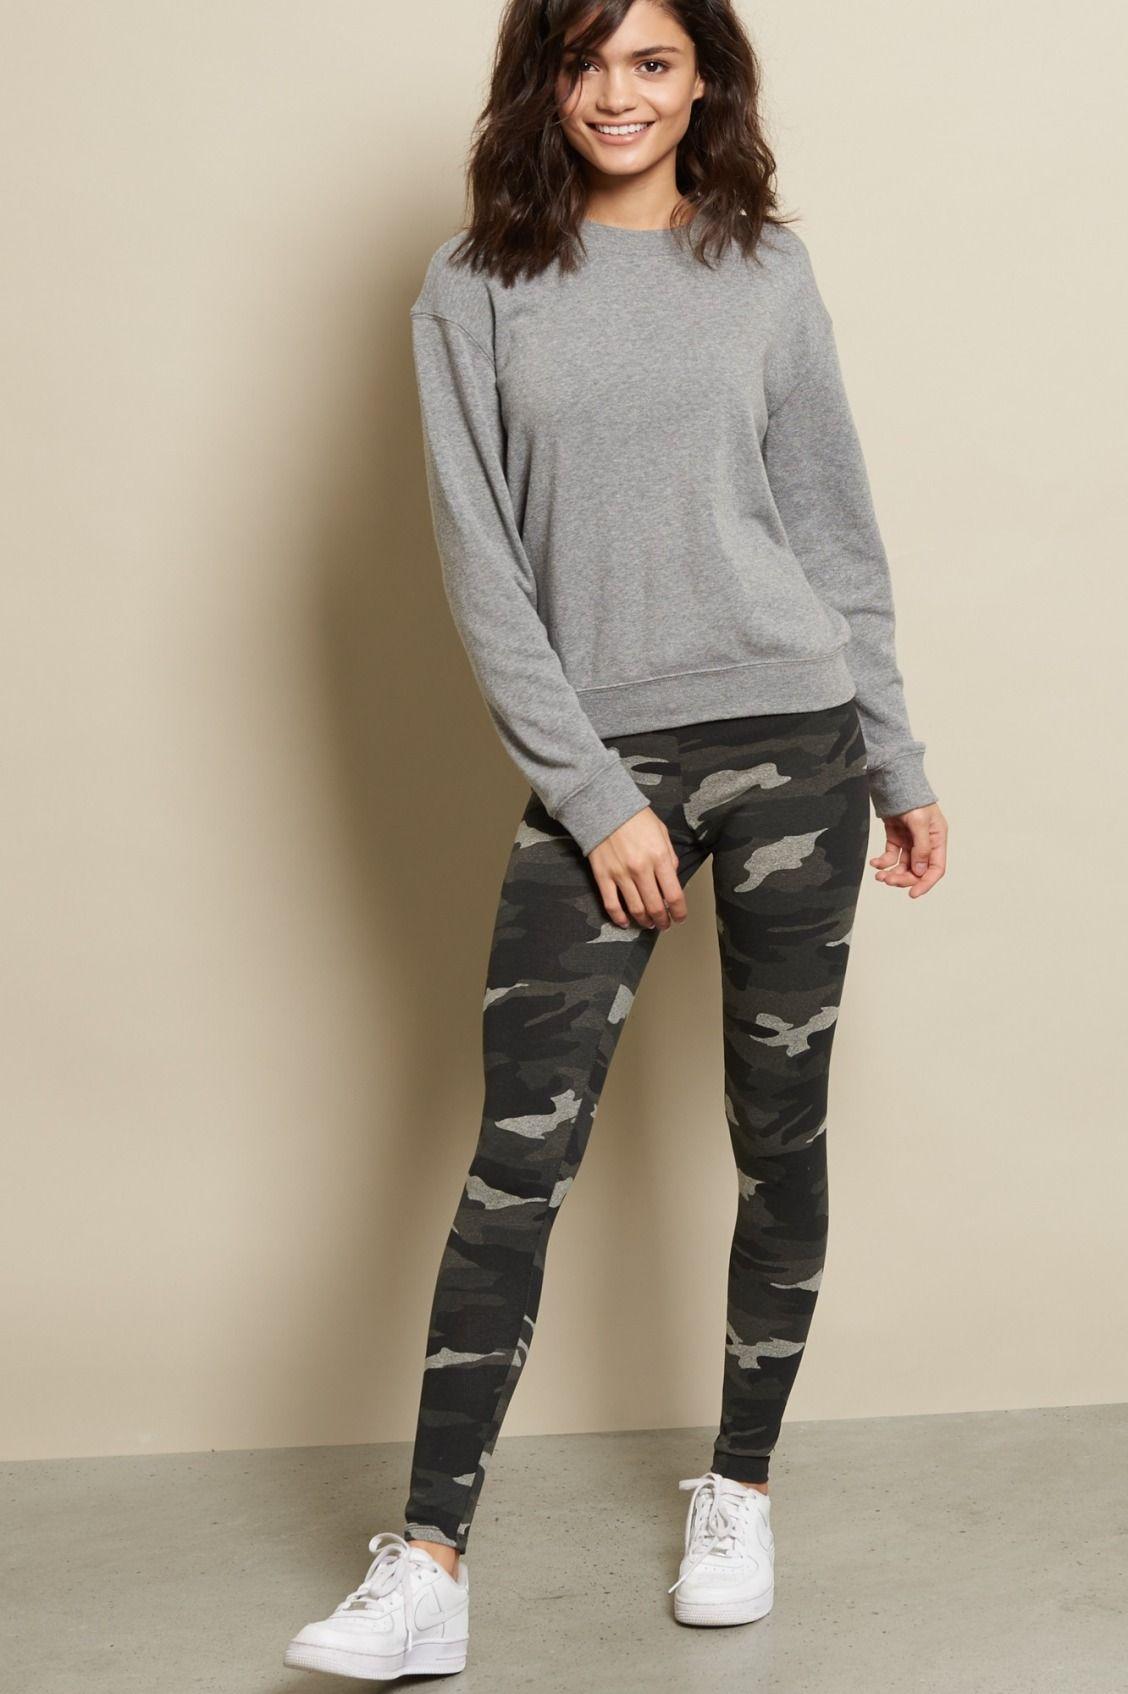 New Women/'s Camouflage Army Print Leggings Pants Trouser Top /& Cap Long Sleeve